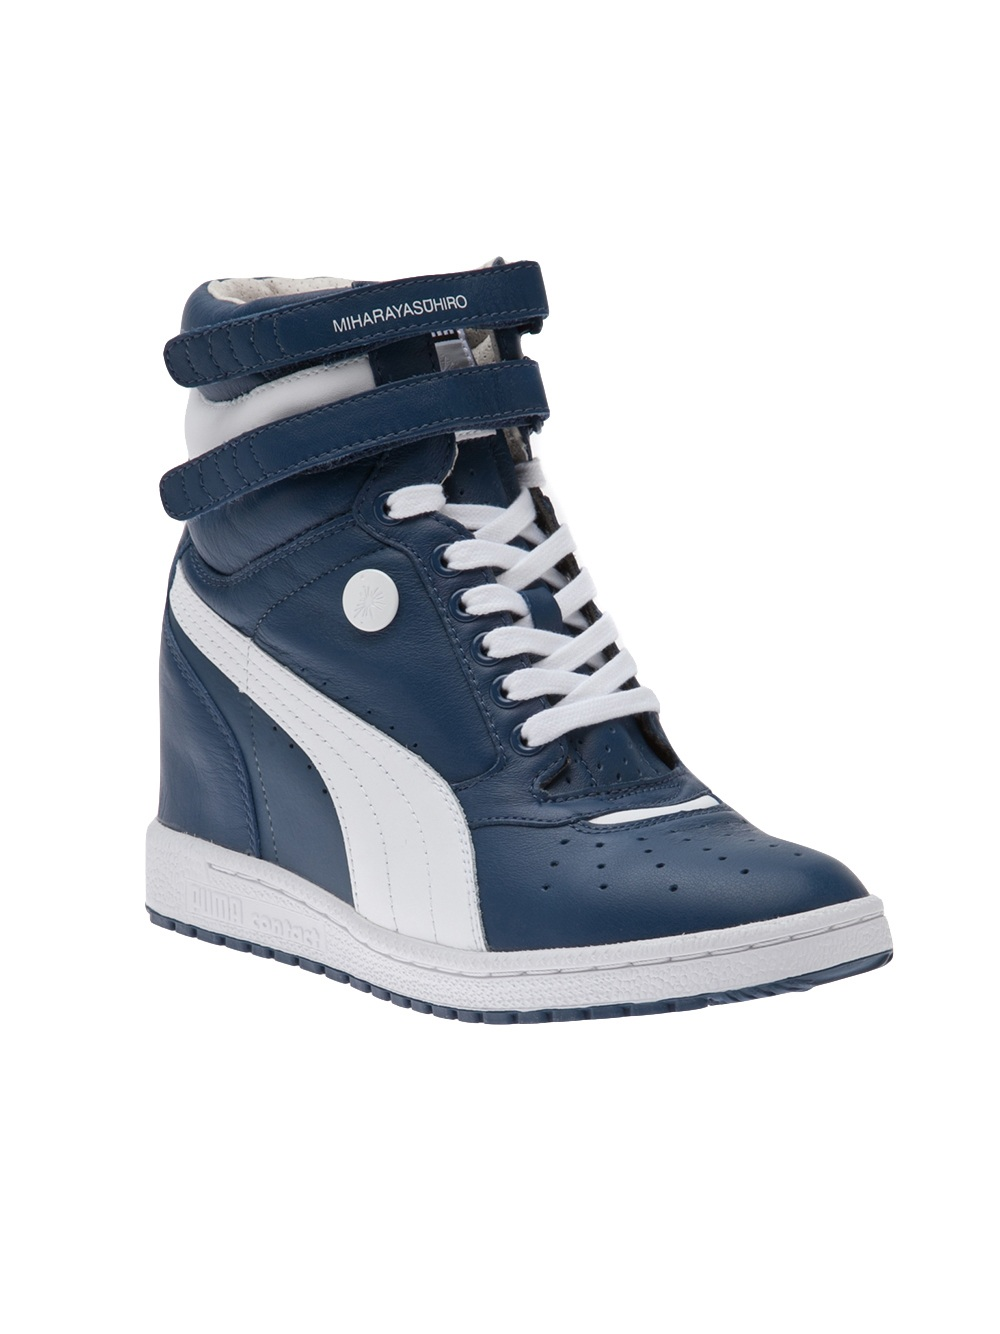 9ffe0dcd0c8c Puma My66 Mihara Sneaker in Blue - Lyst